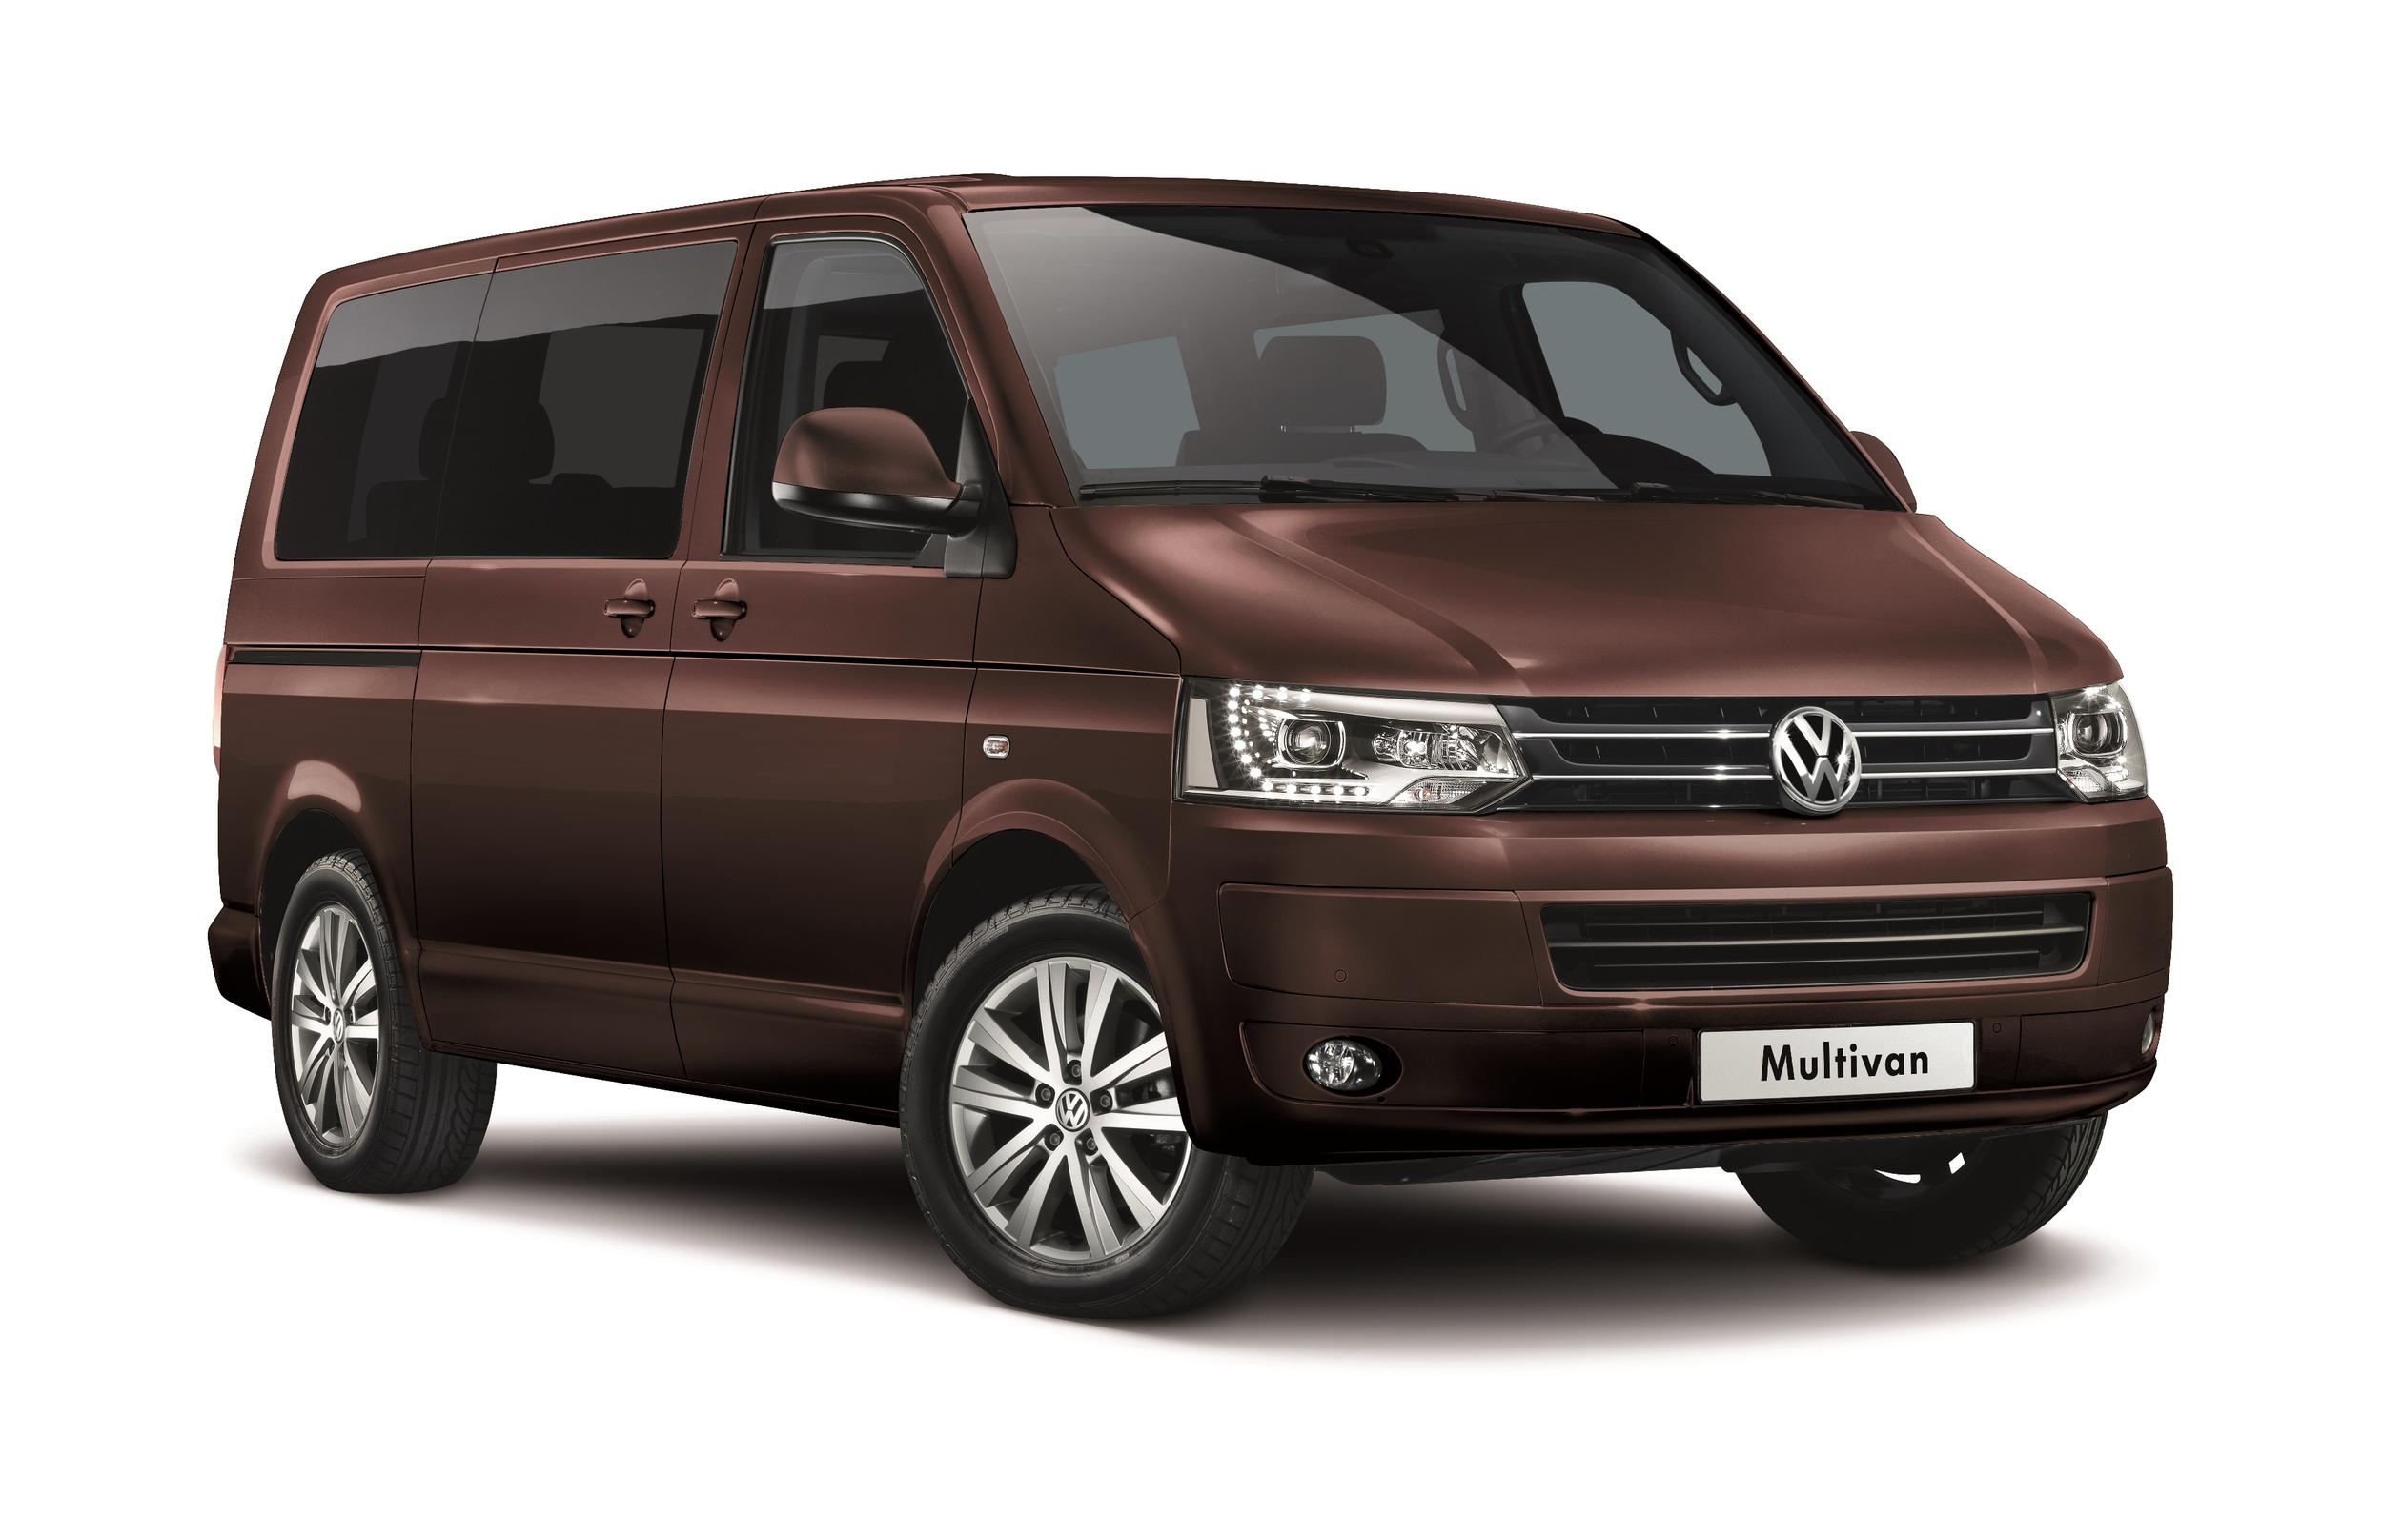 volkswagen multivan premium la versi n m s lujosa de la furgoneta. Black Bedroom Furniture Sets. Home Design Ideas